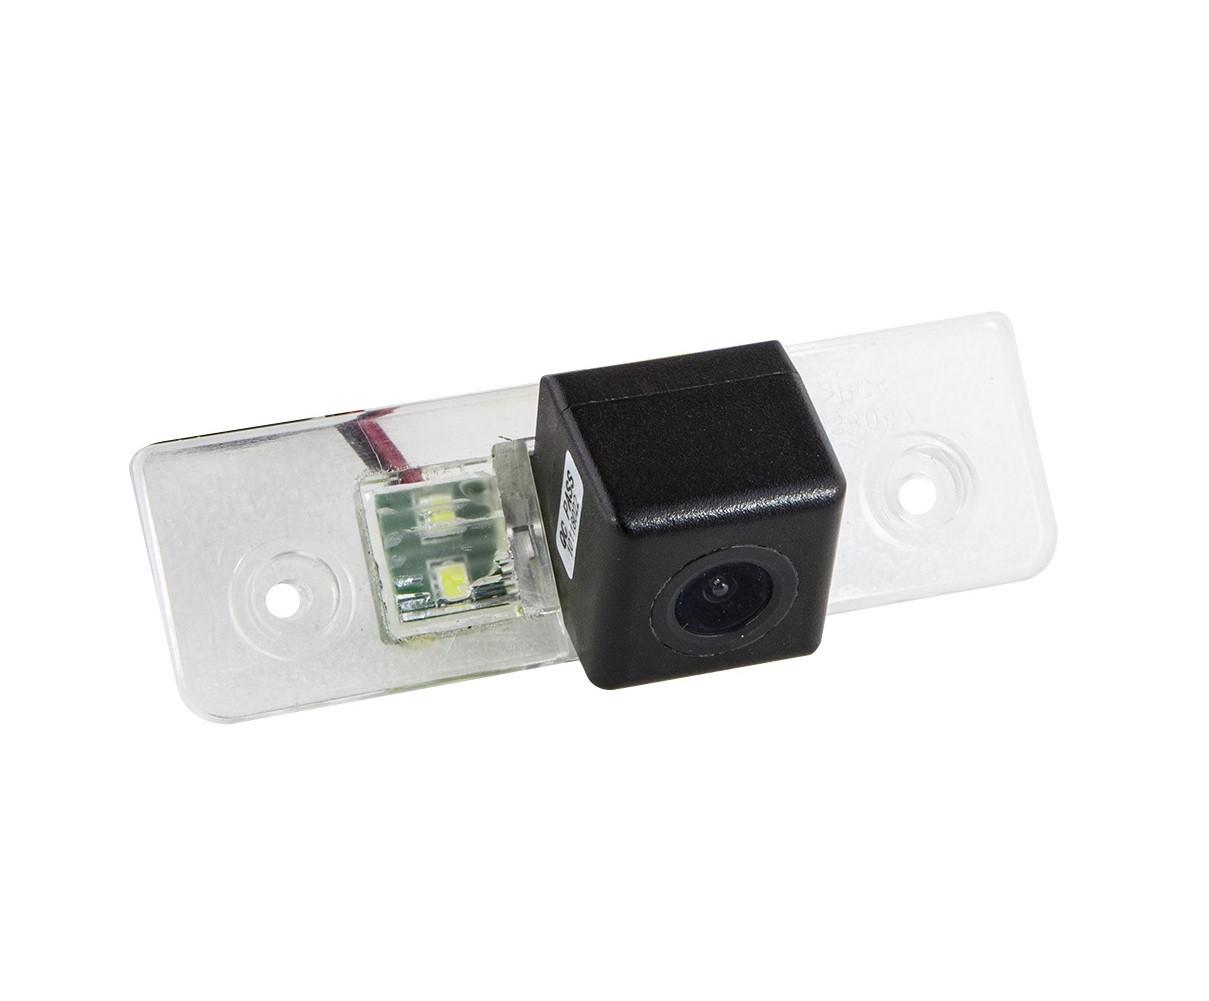 Штатная камера заднего вида Falcon SC04-XCCD. Octavia A5 2004-2013/Ford Fiesta 2002-2008/Ford Fusion 2002-2012